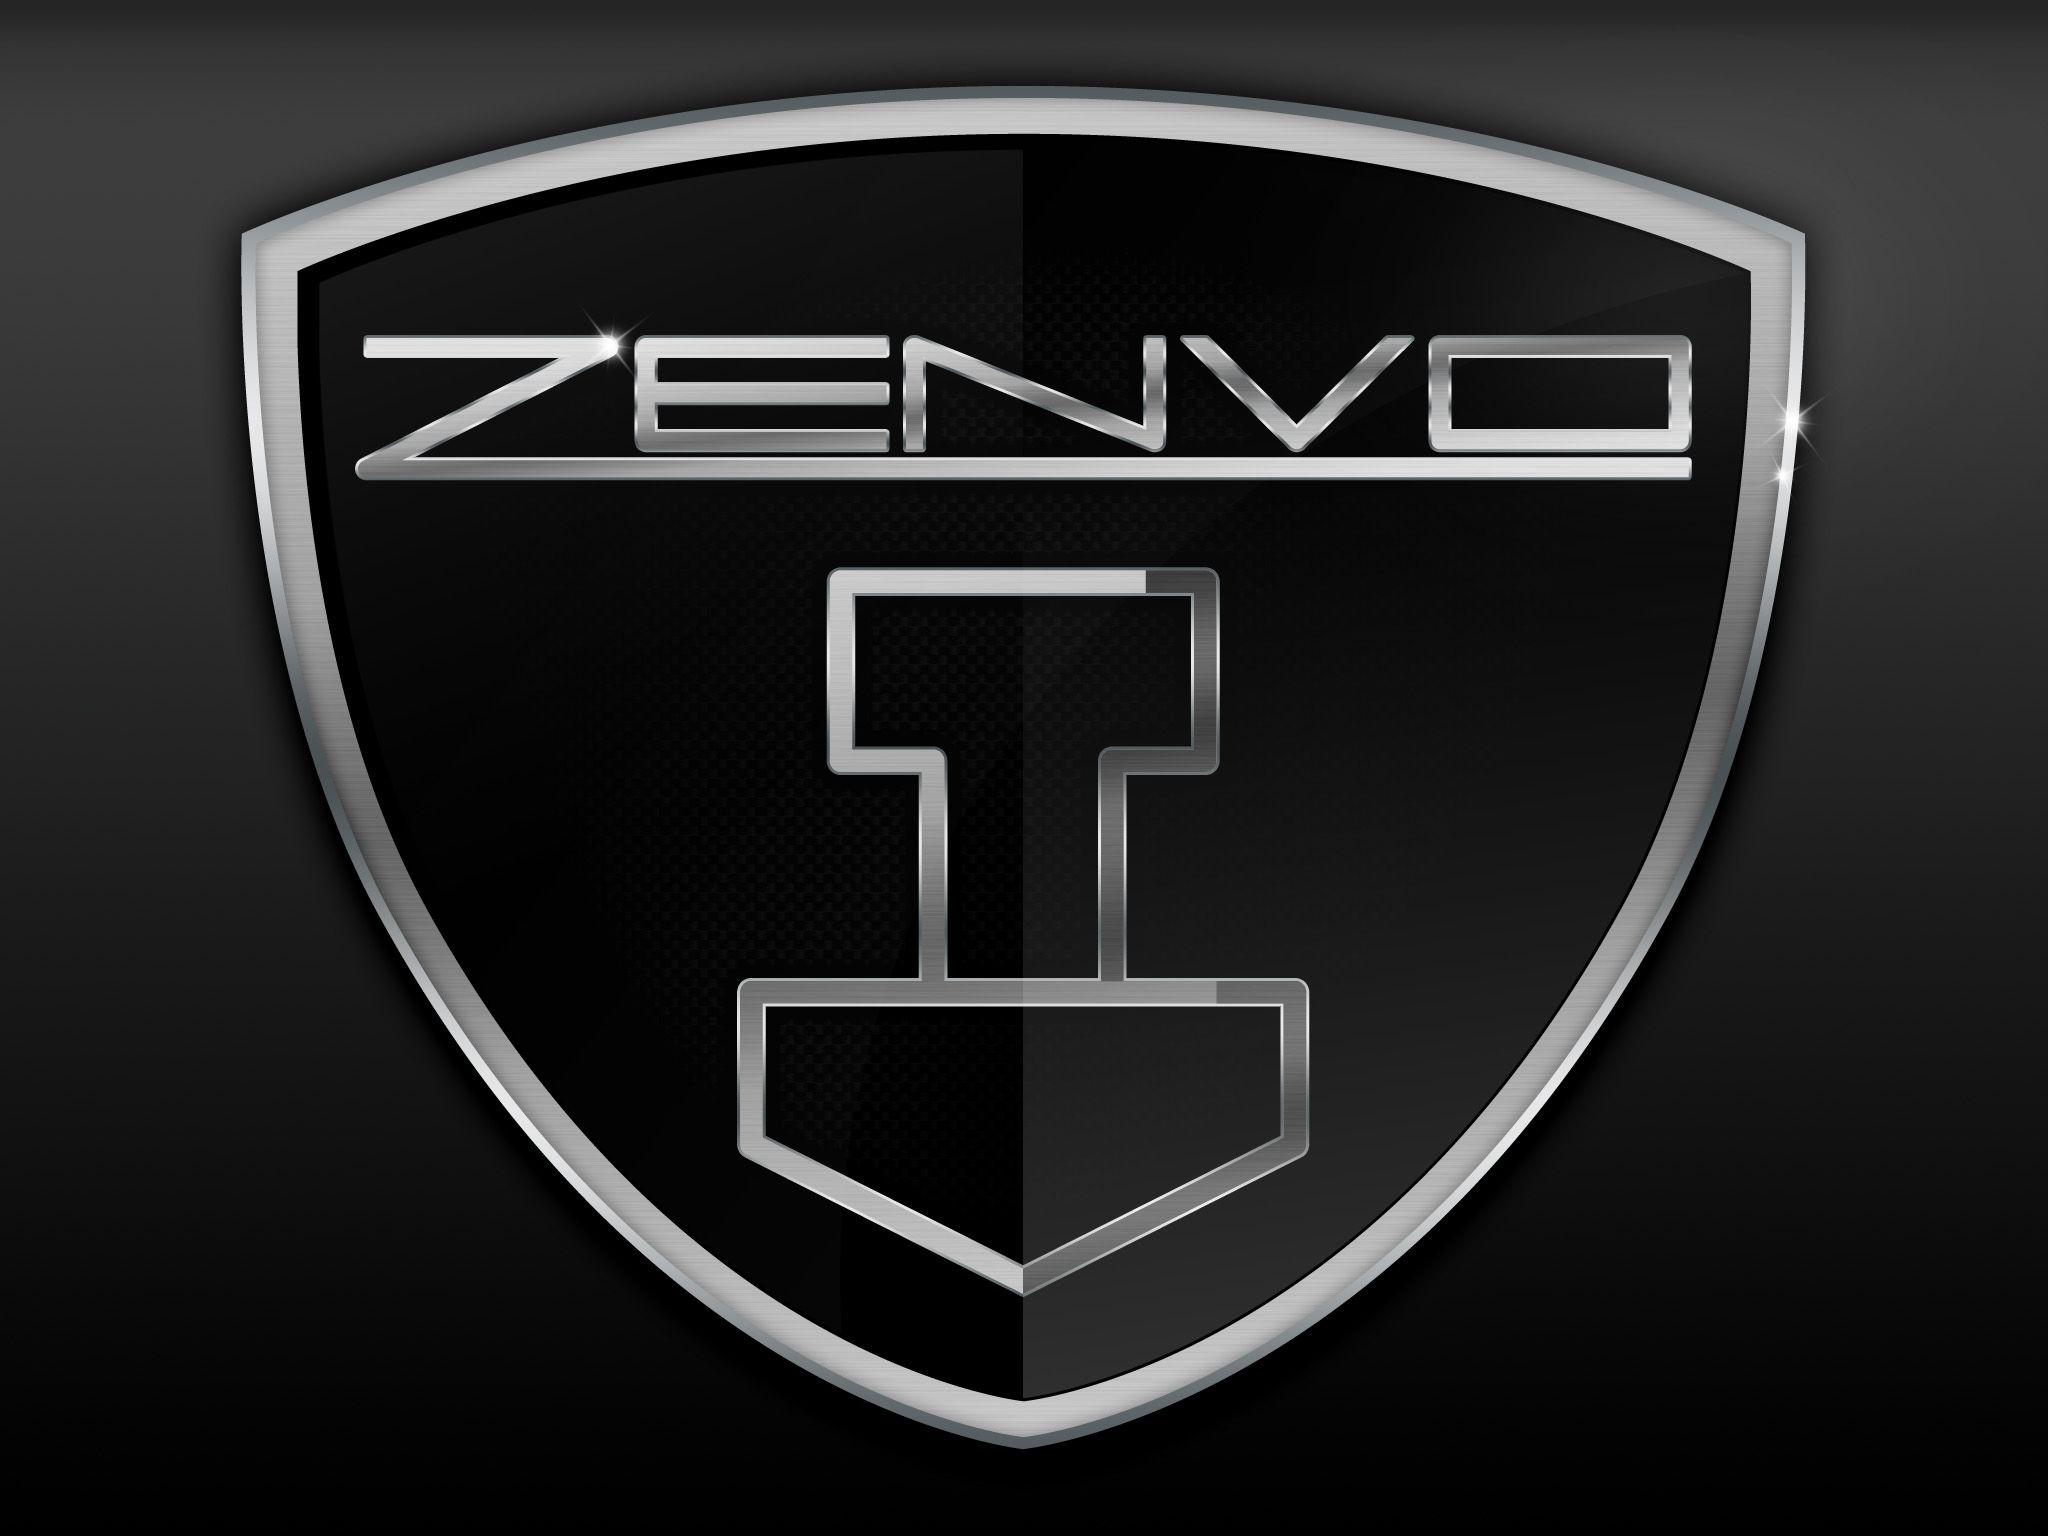 ZENVO logo hd Google Search Carros